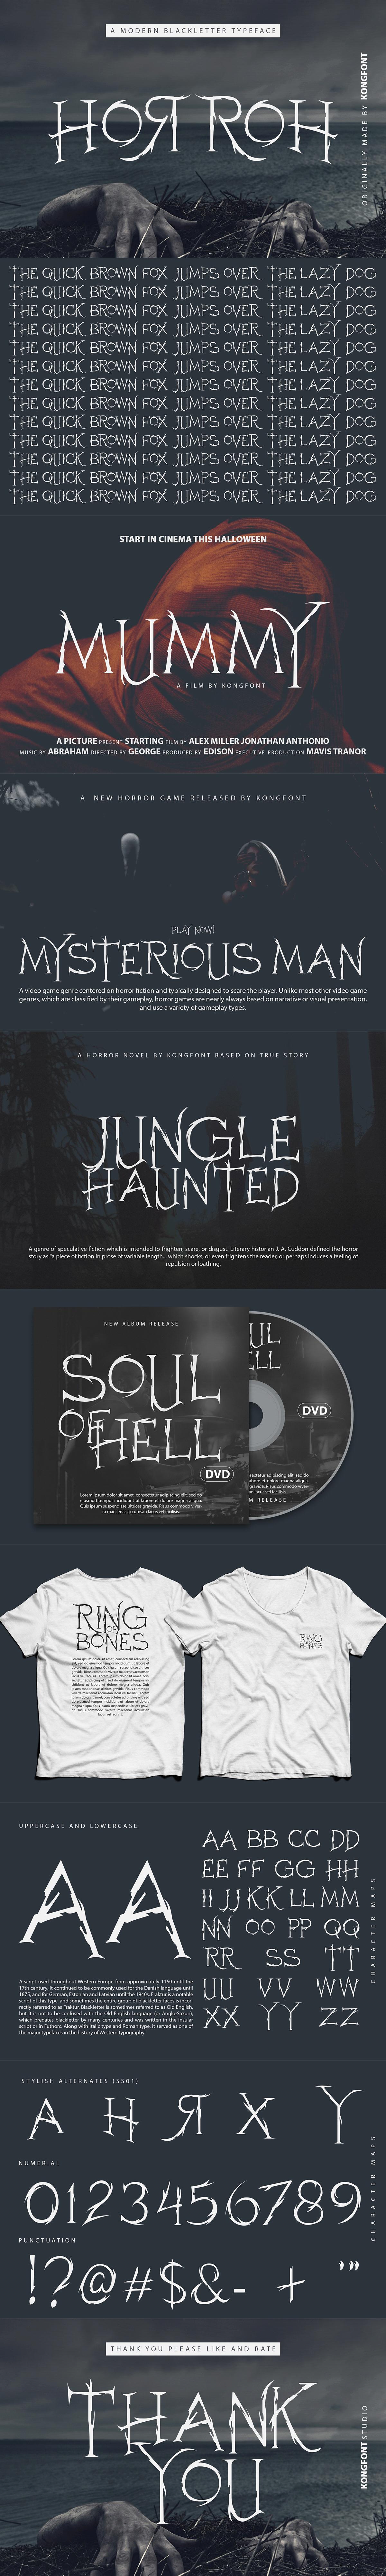 Blackletter branding  creepy Display font fonts horroh